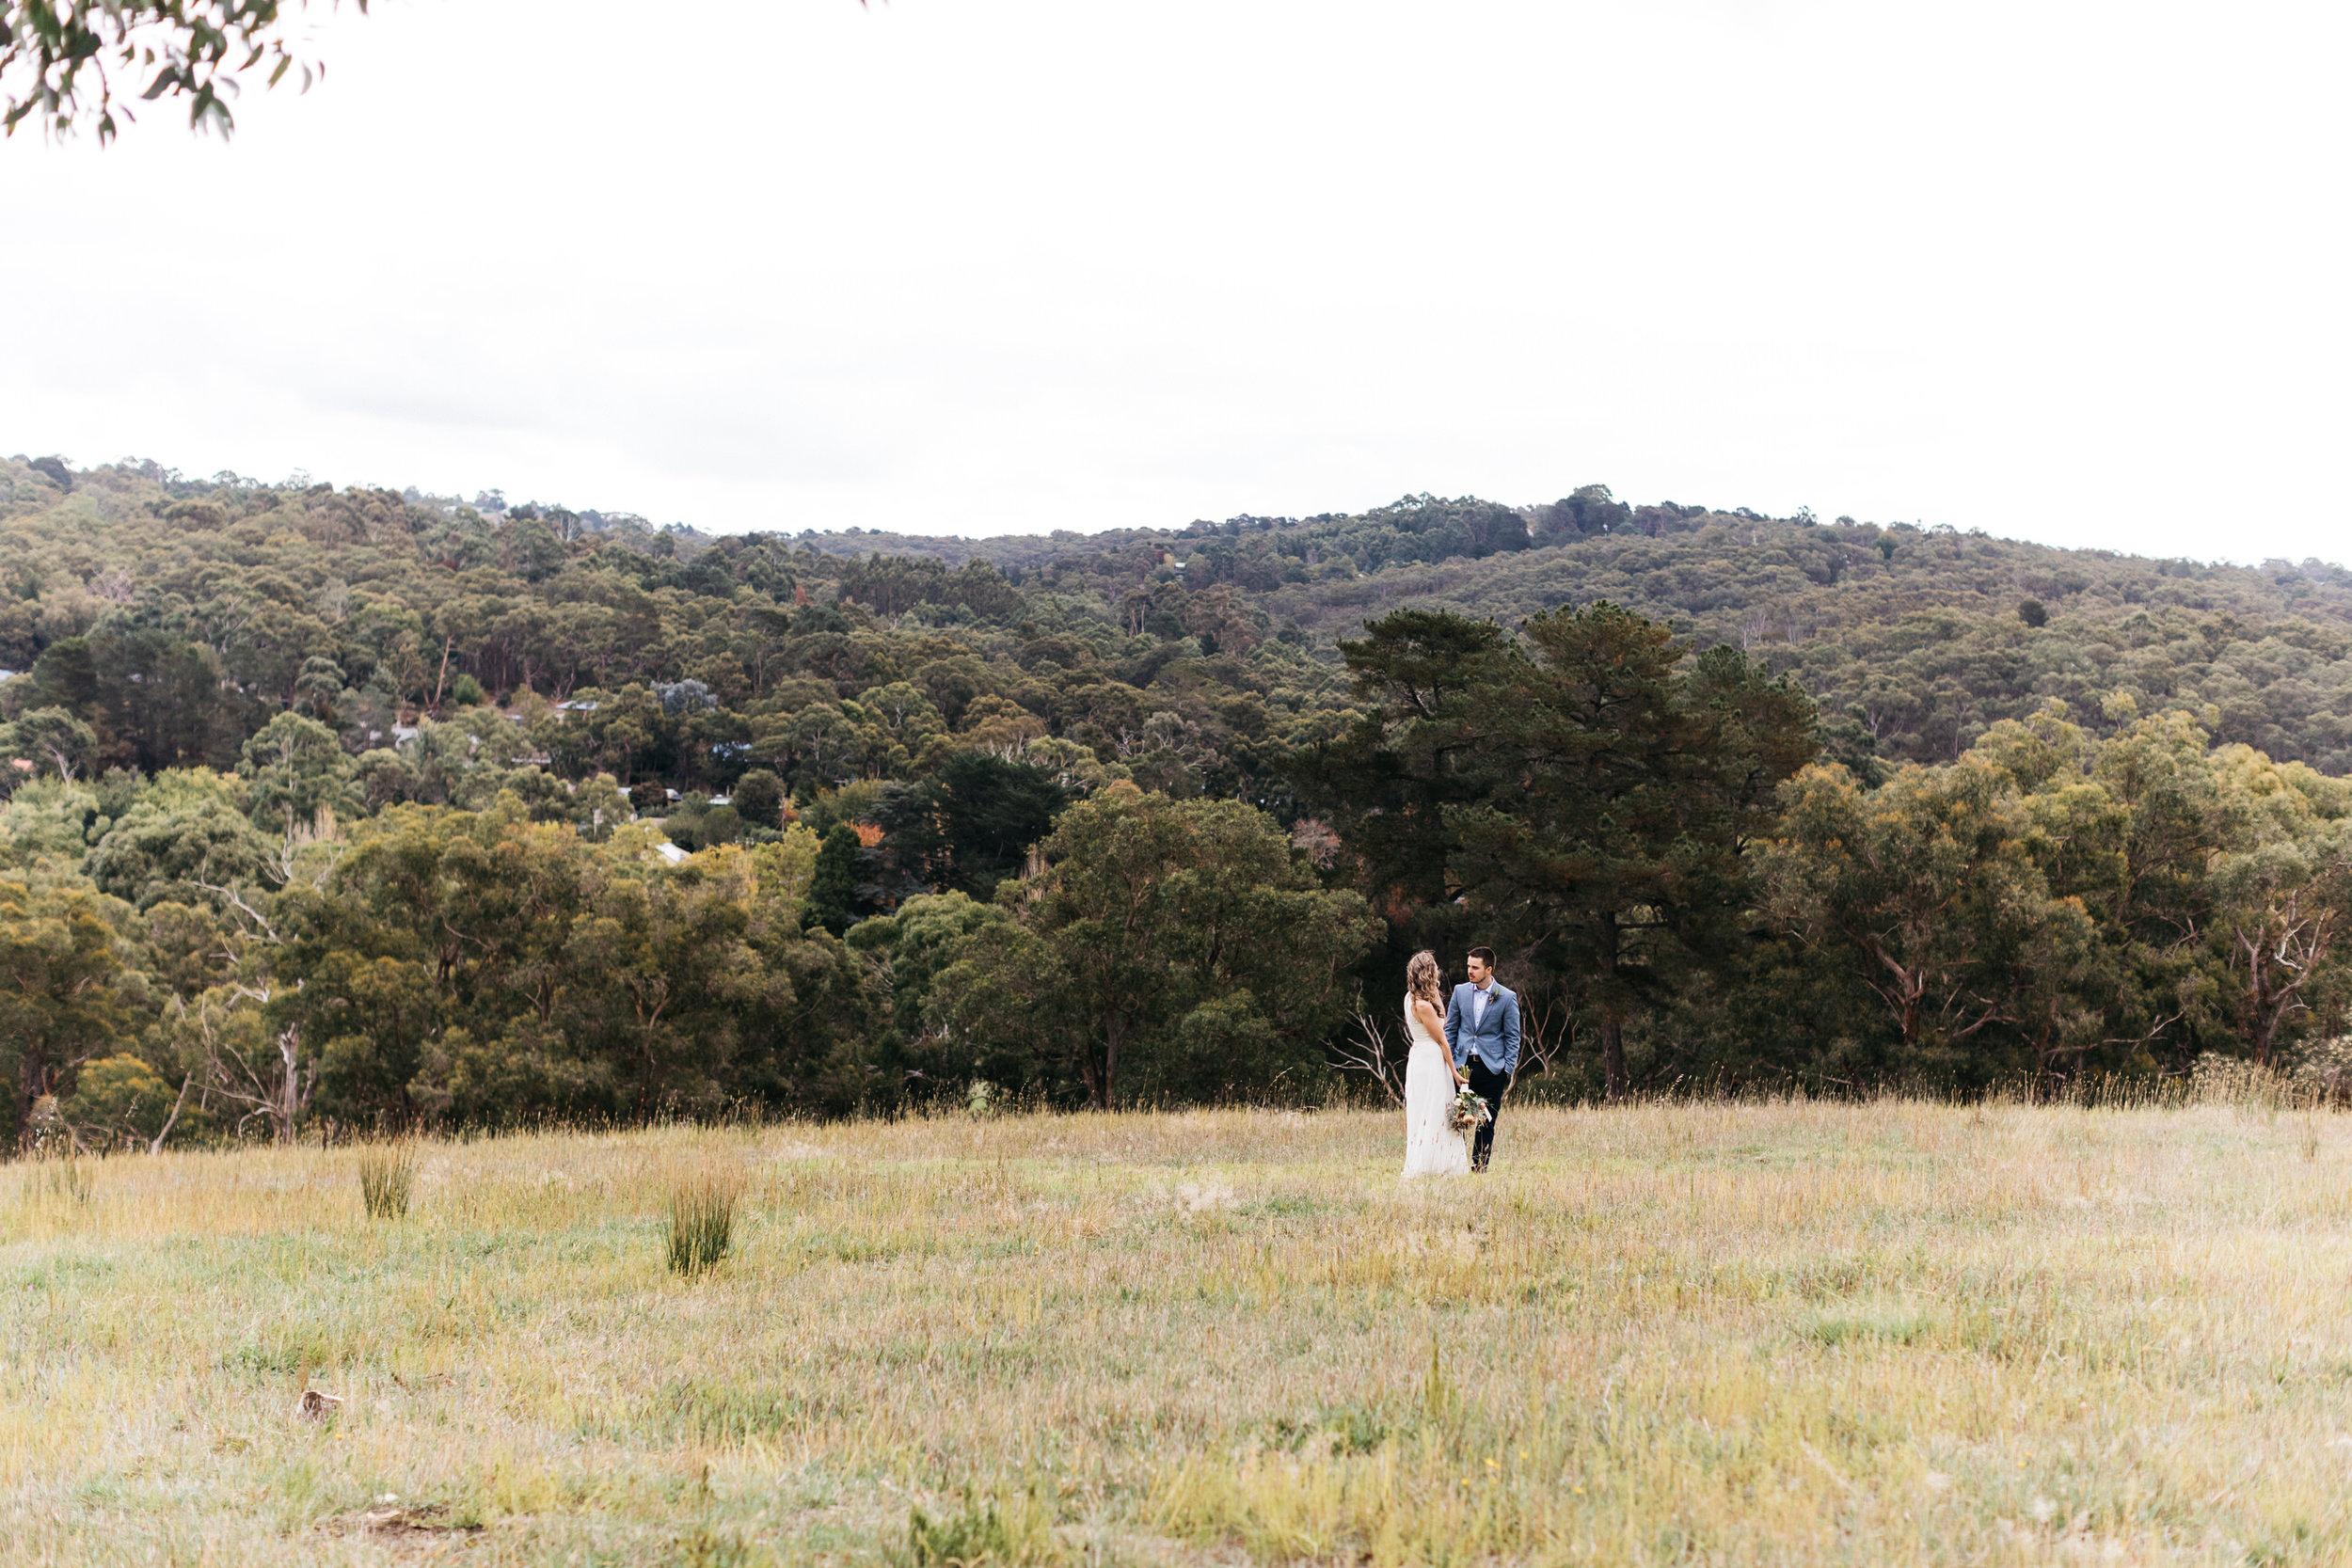 Mylor Farm Elopement South Australia 026.jpg